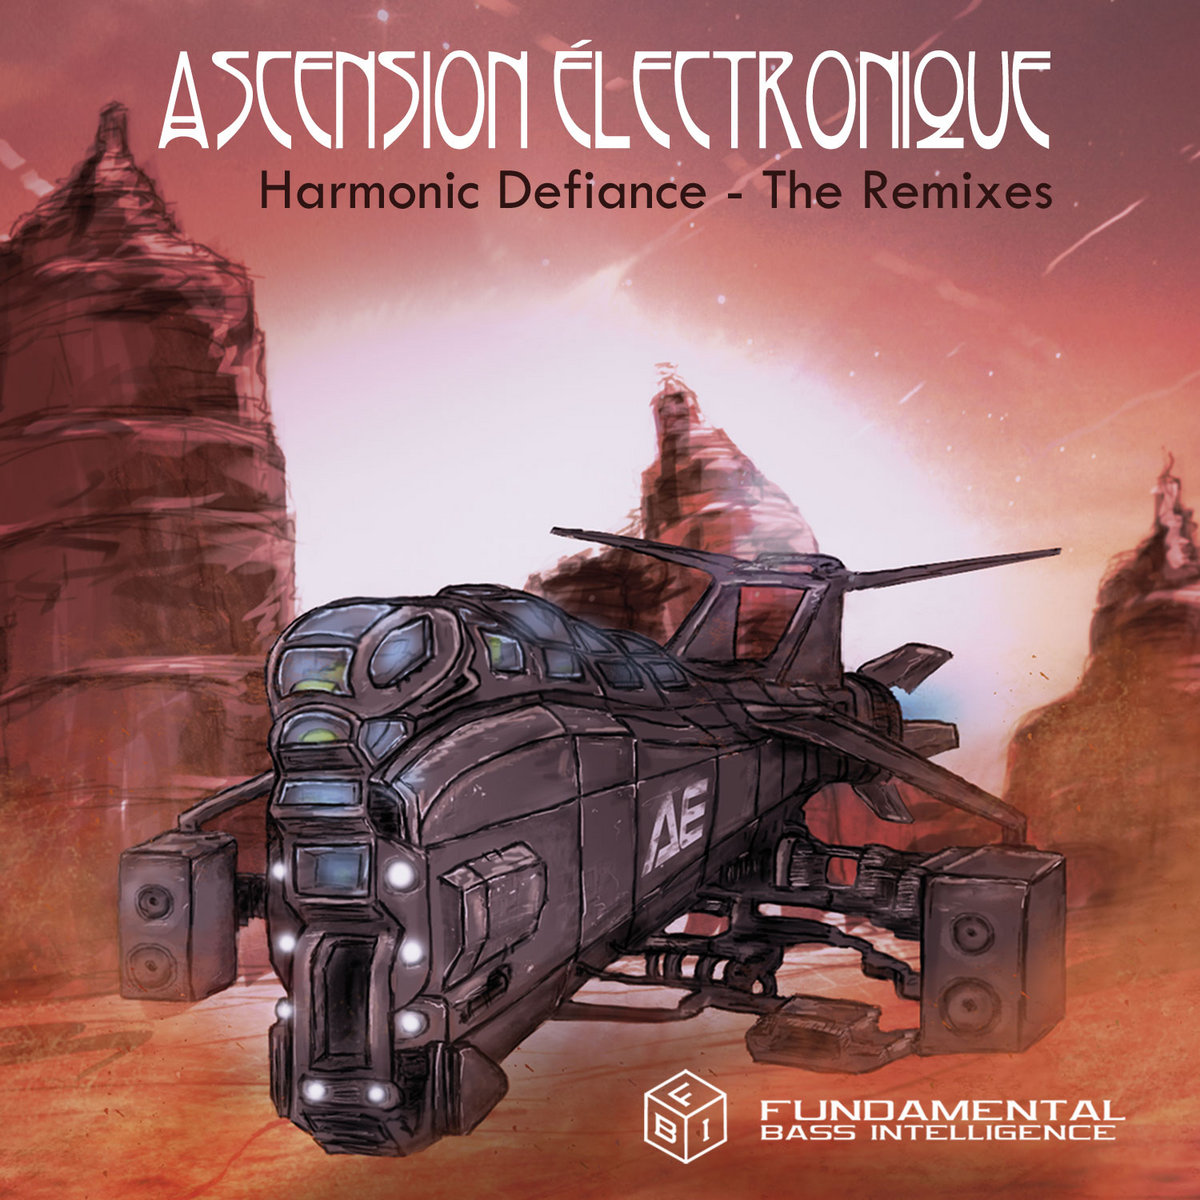 FBI009 | Harmonic Defiance ( THE REMIXES ) feat. Dexorcist, Mandroid, Sbles3plex... A0334521175_10